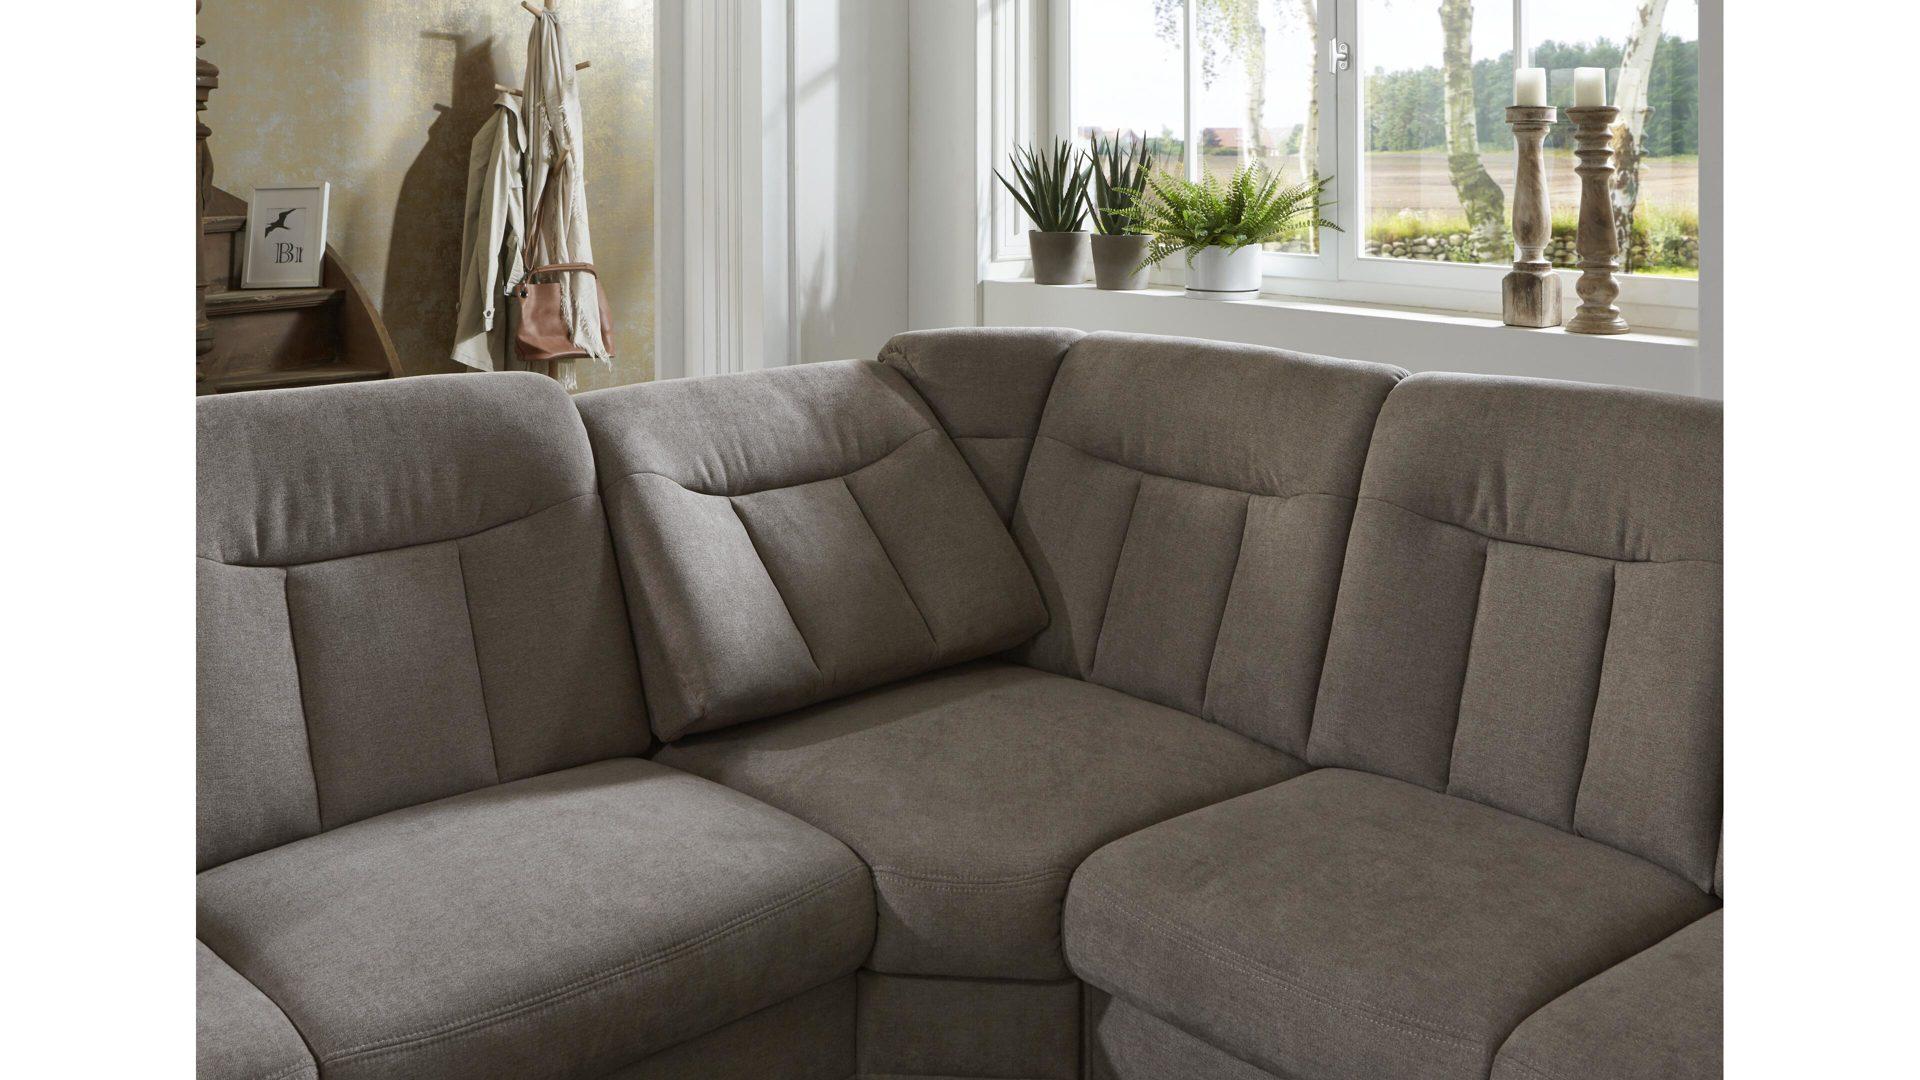 Ecksofa Chenille Couch Cord Neu Fotos Samson Corner 2 3 Seater